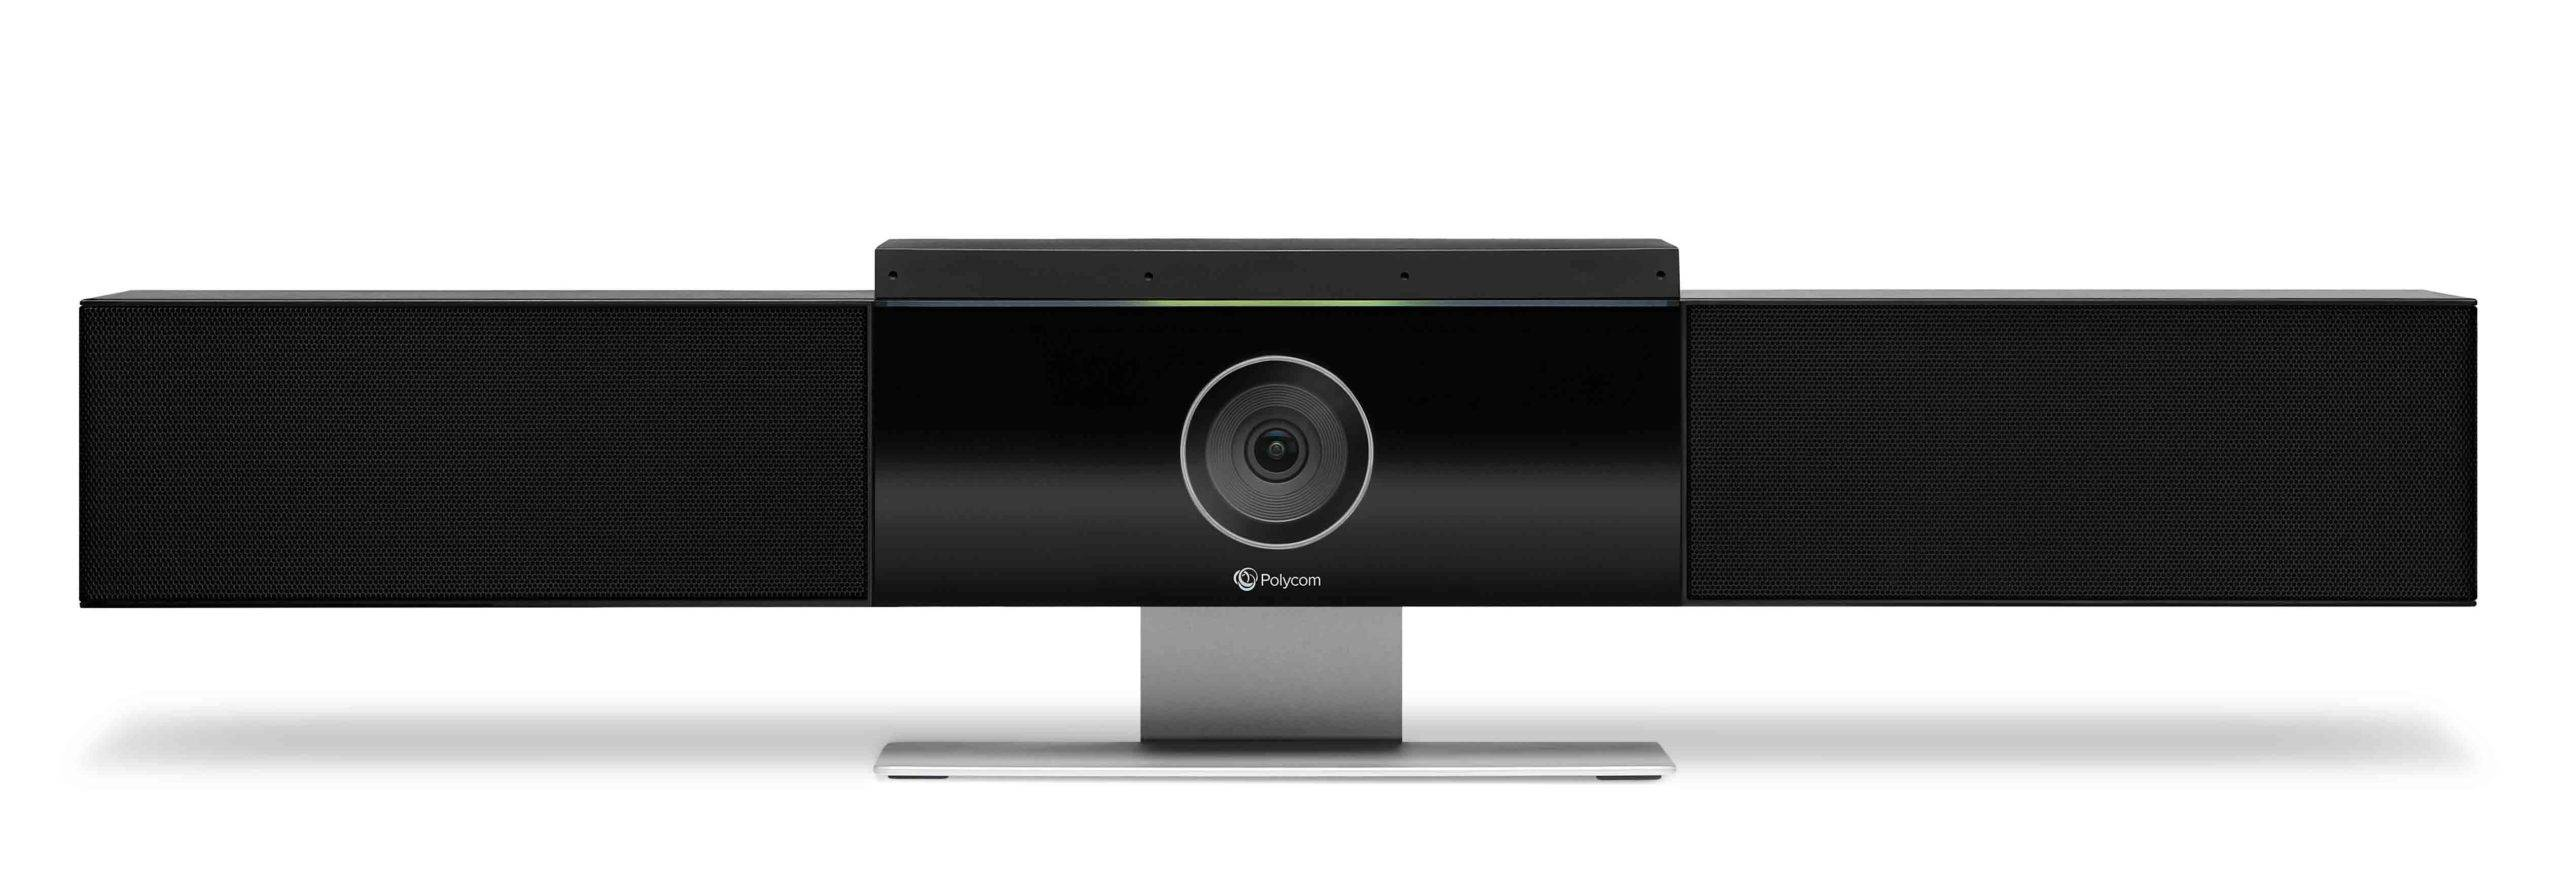 Polycom Studio Usb Soundbar 120 4k Camera